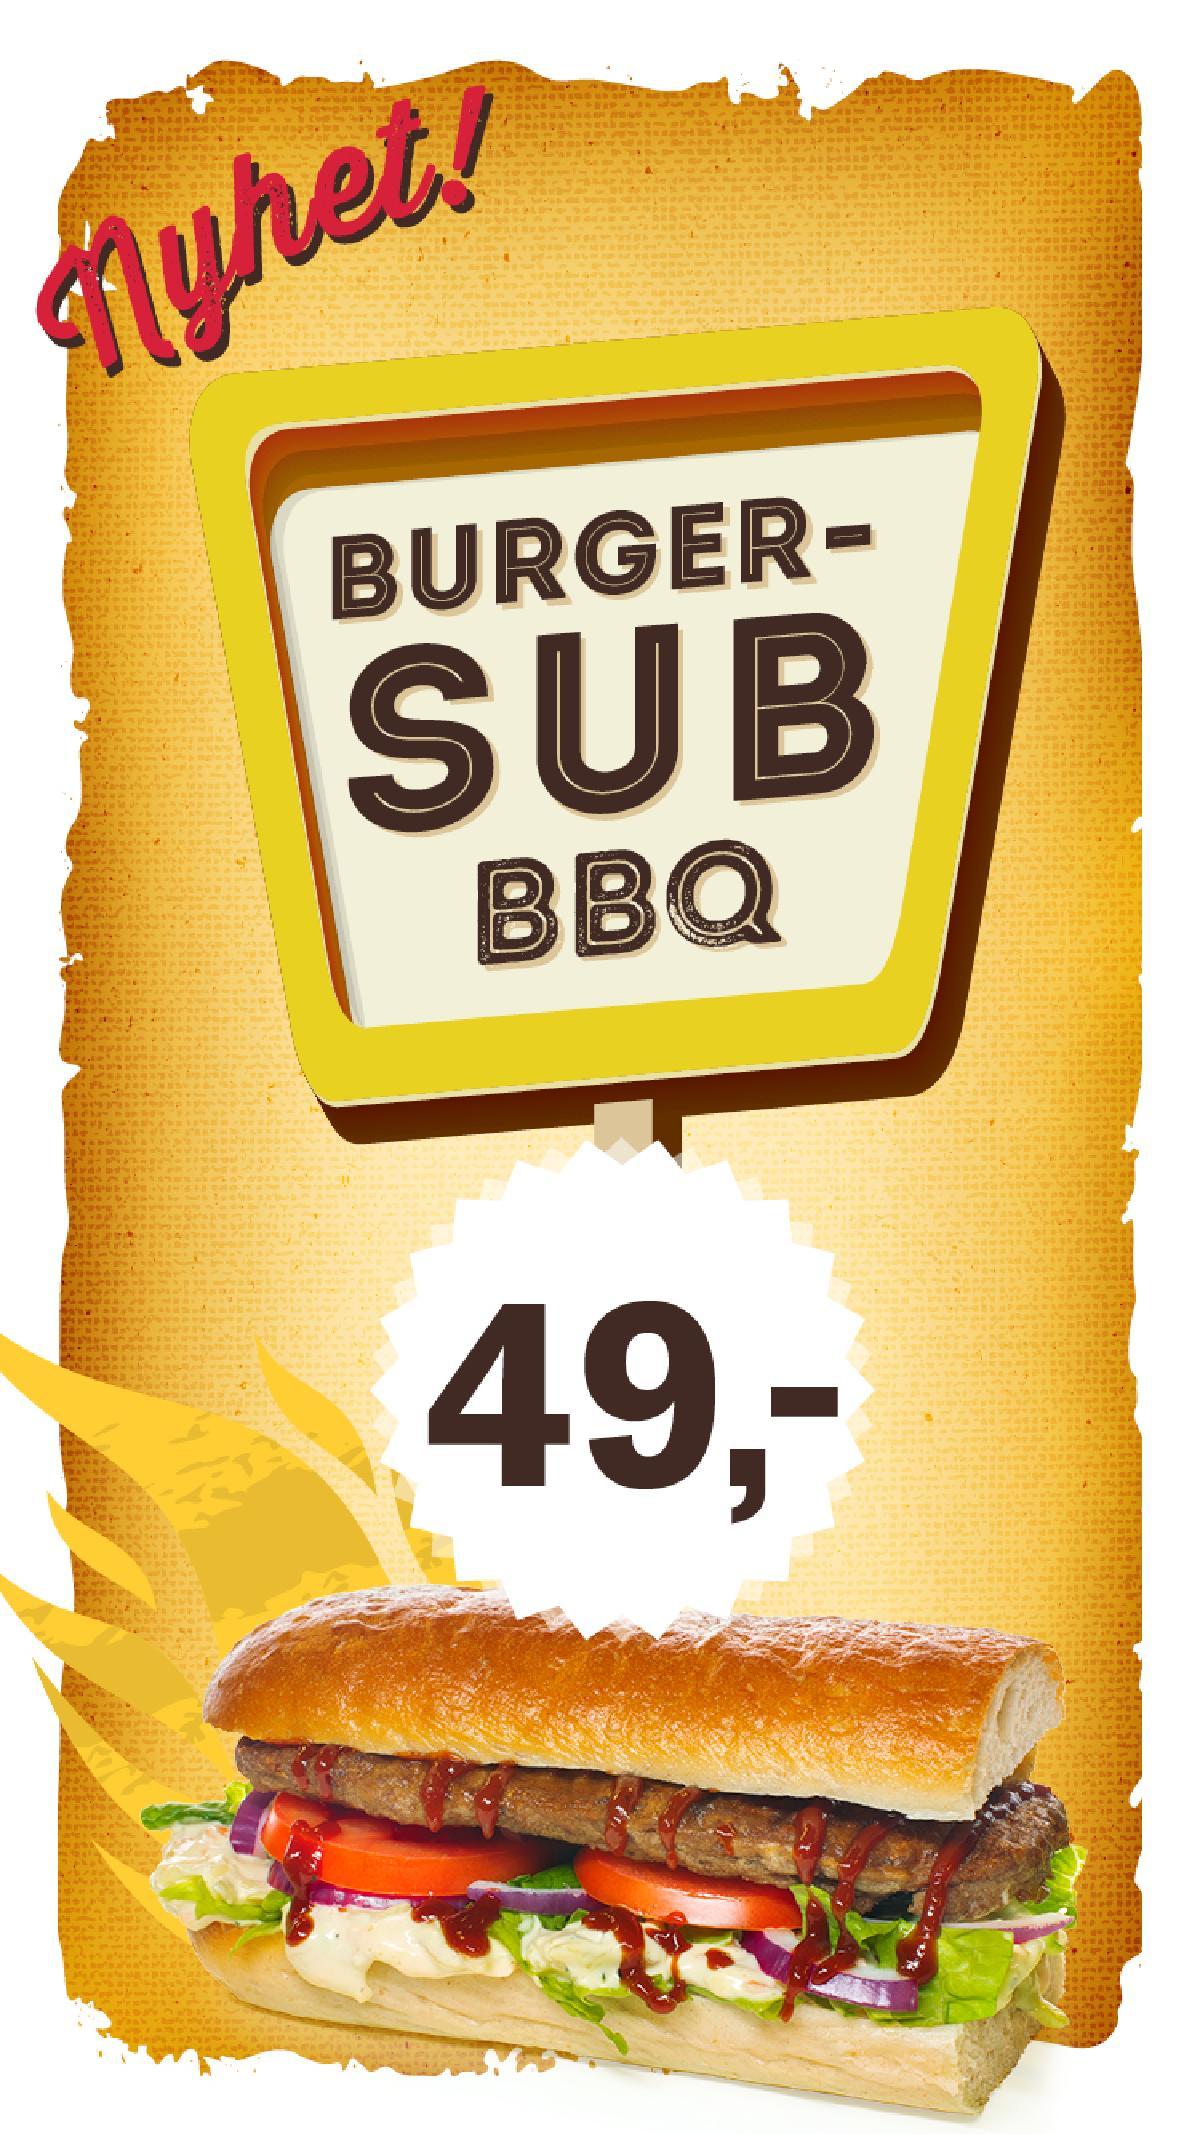 BB_Burgersub_mobil.jpg